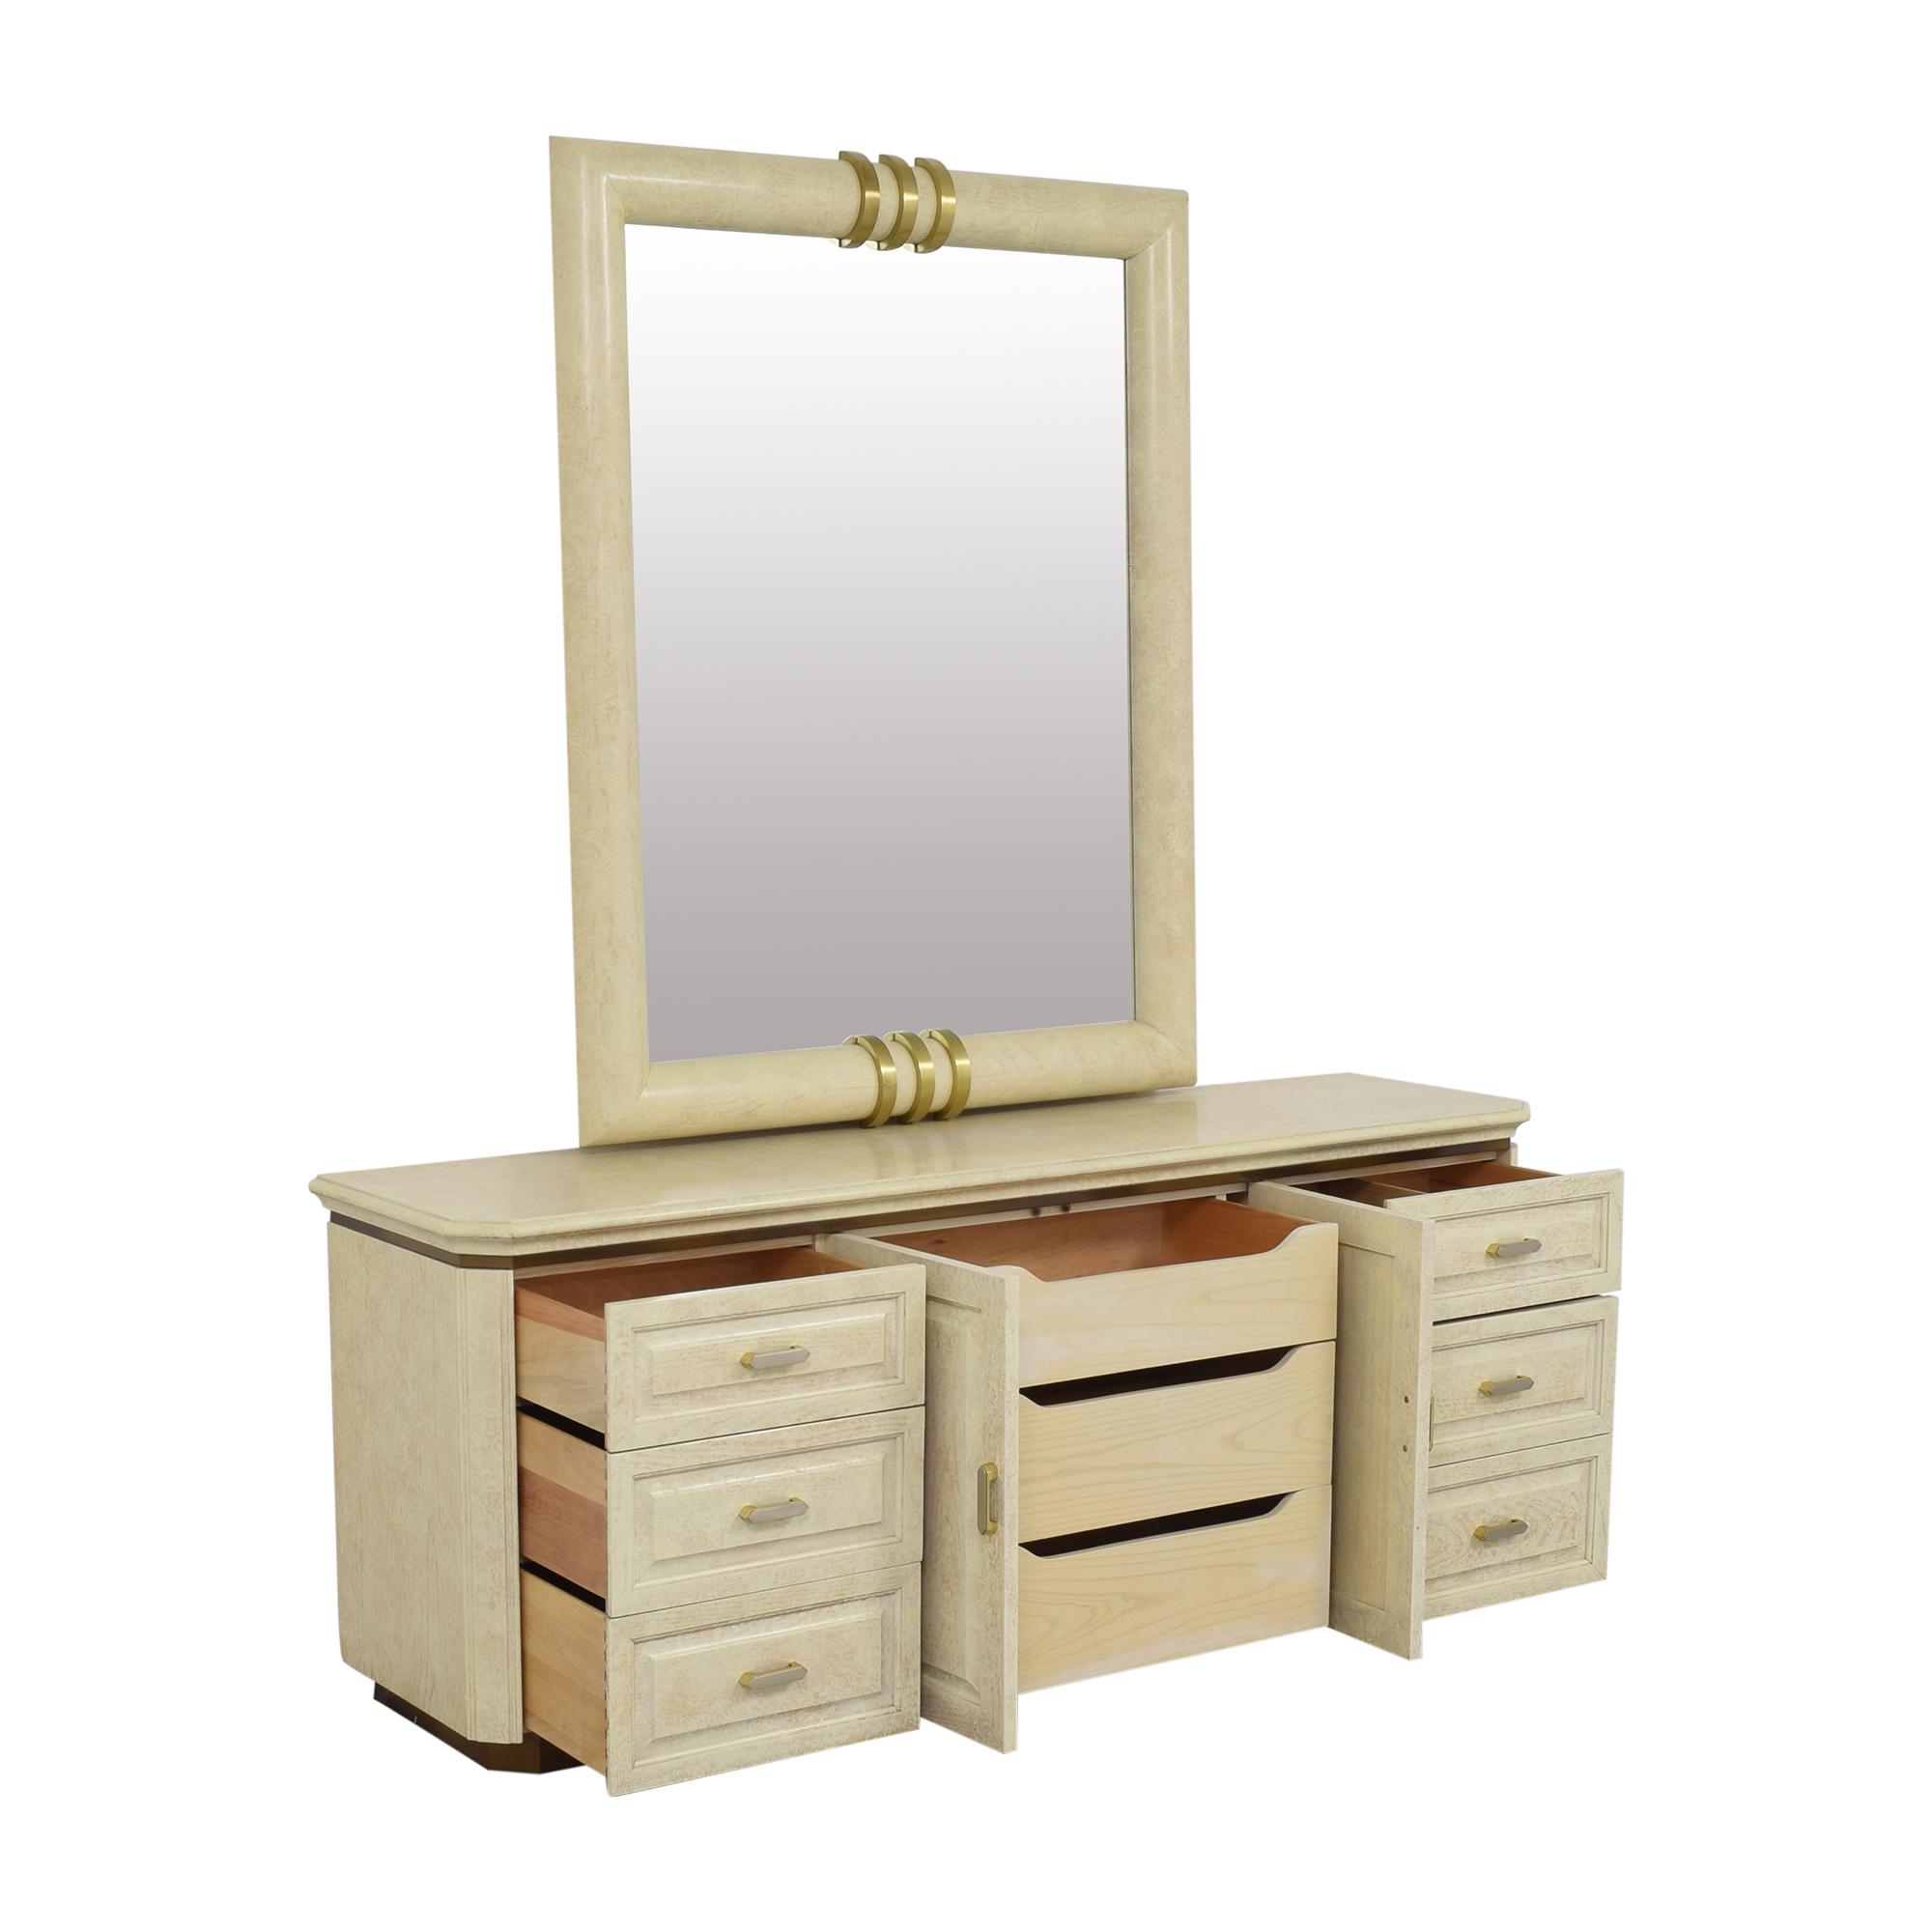 Henredon Furniture Henredon Art Deco Style Dresser and Mirror nj